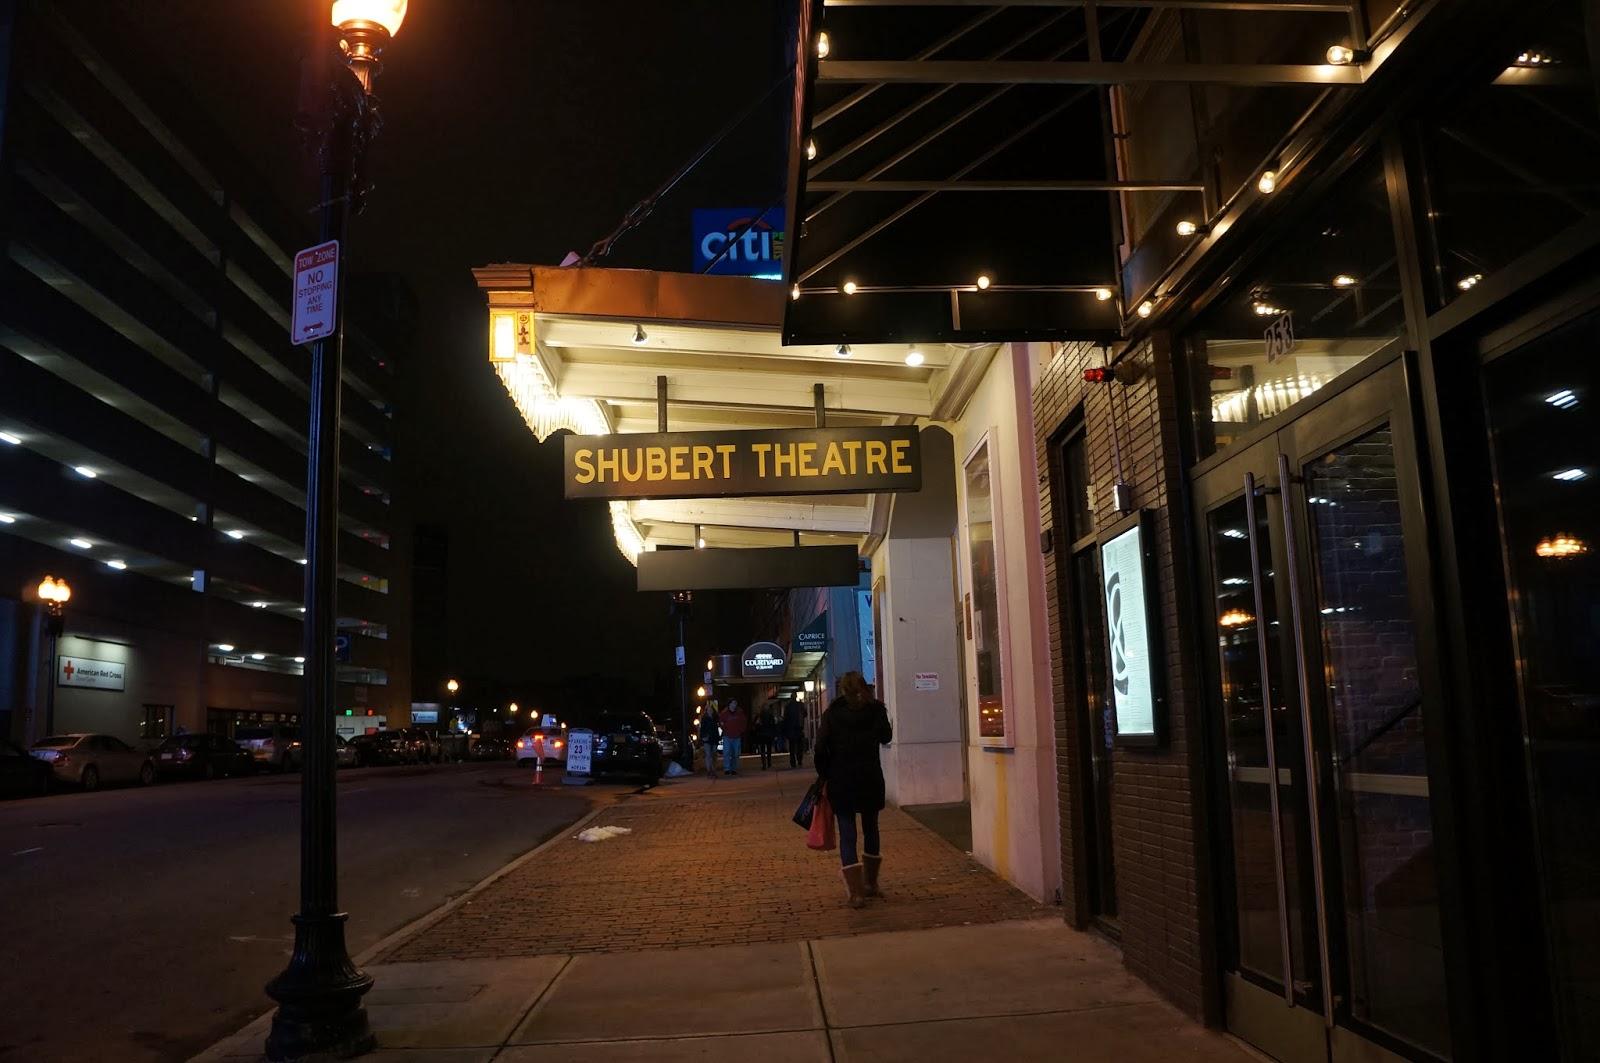 Shubert Theatre in Boston